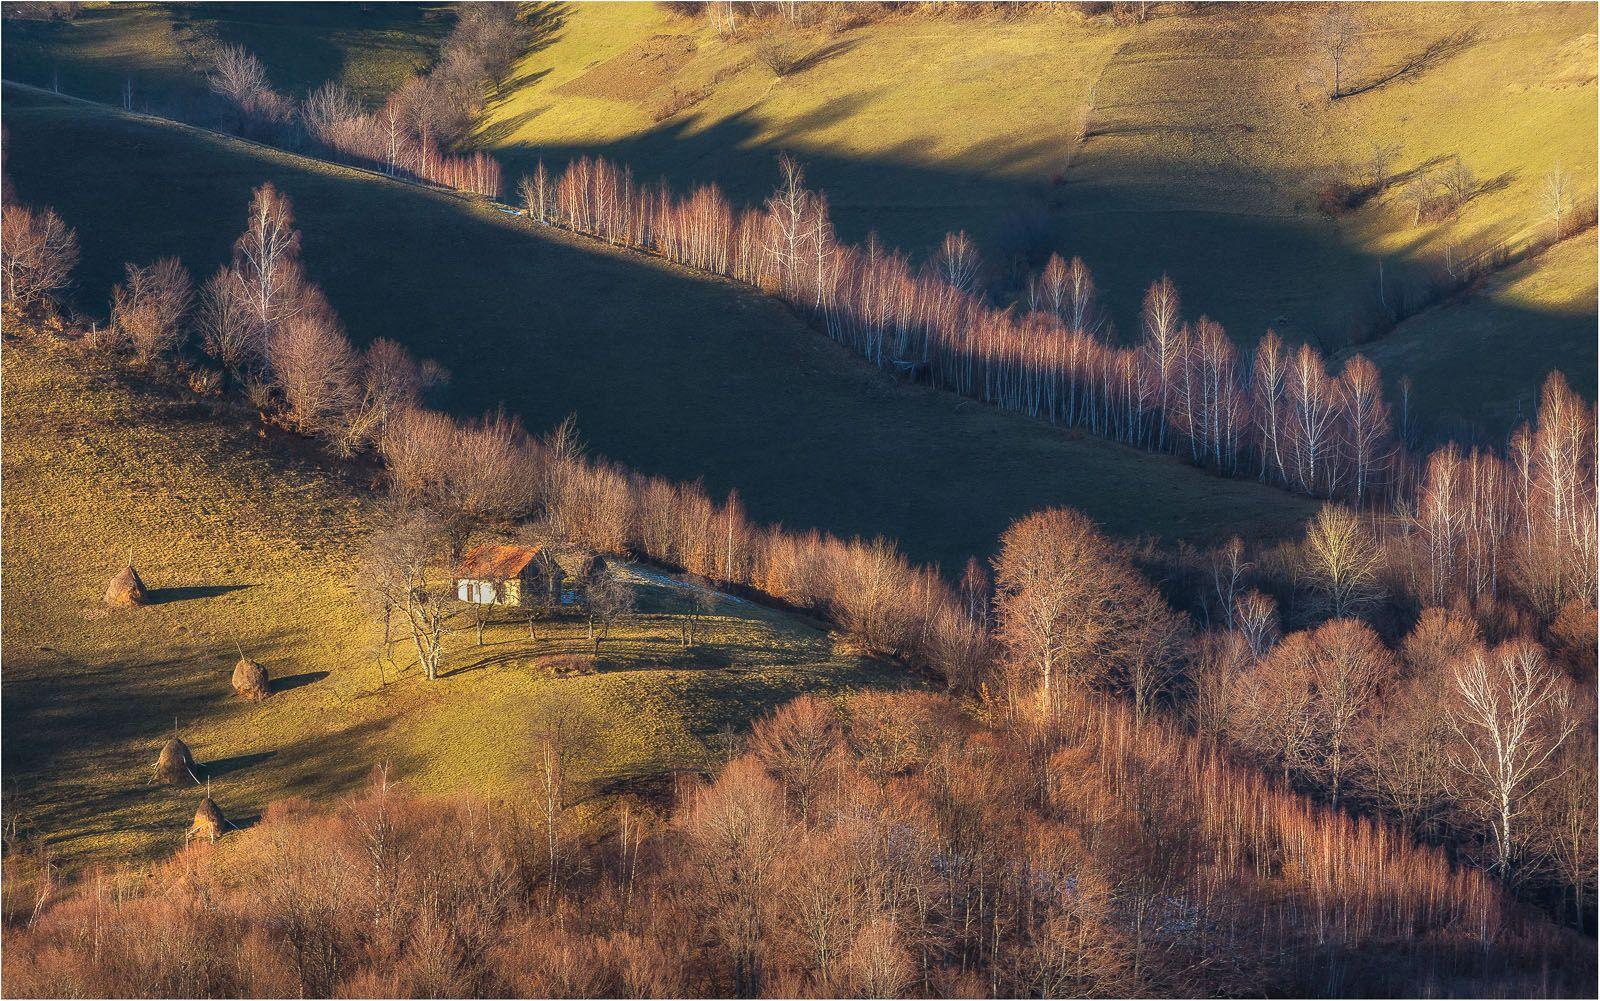 country side, farm, hill, nature, romania, transilvania, travel, Ioan Chiriac